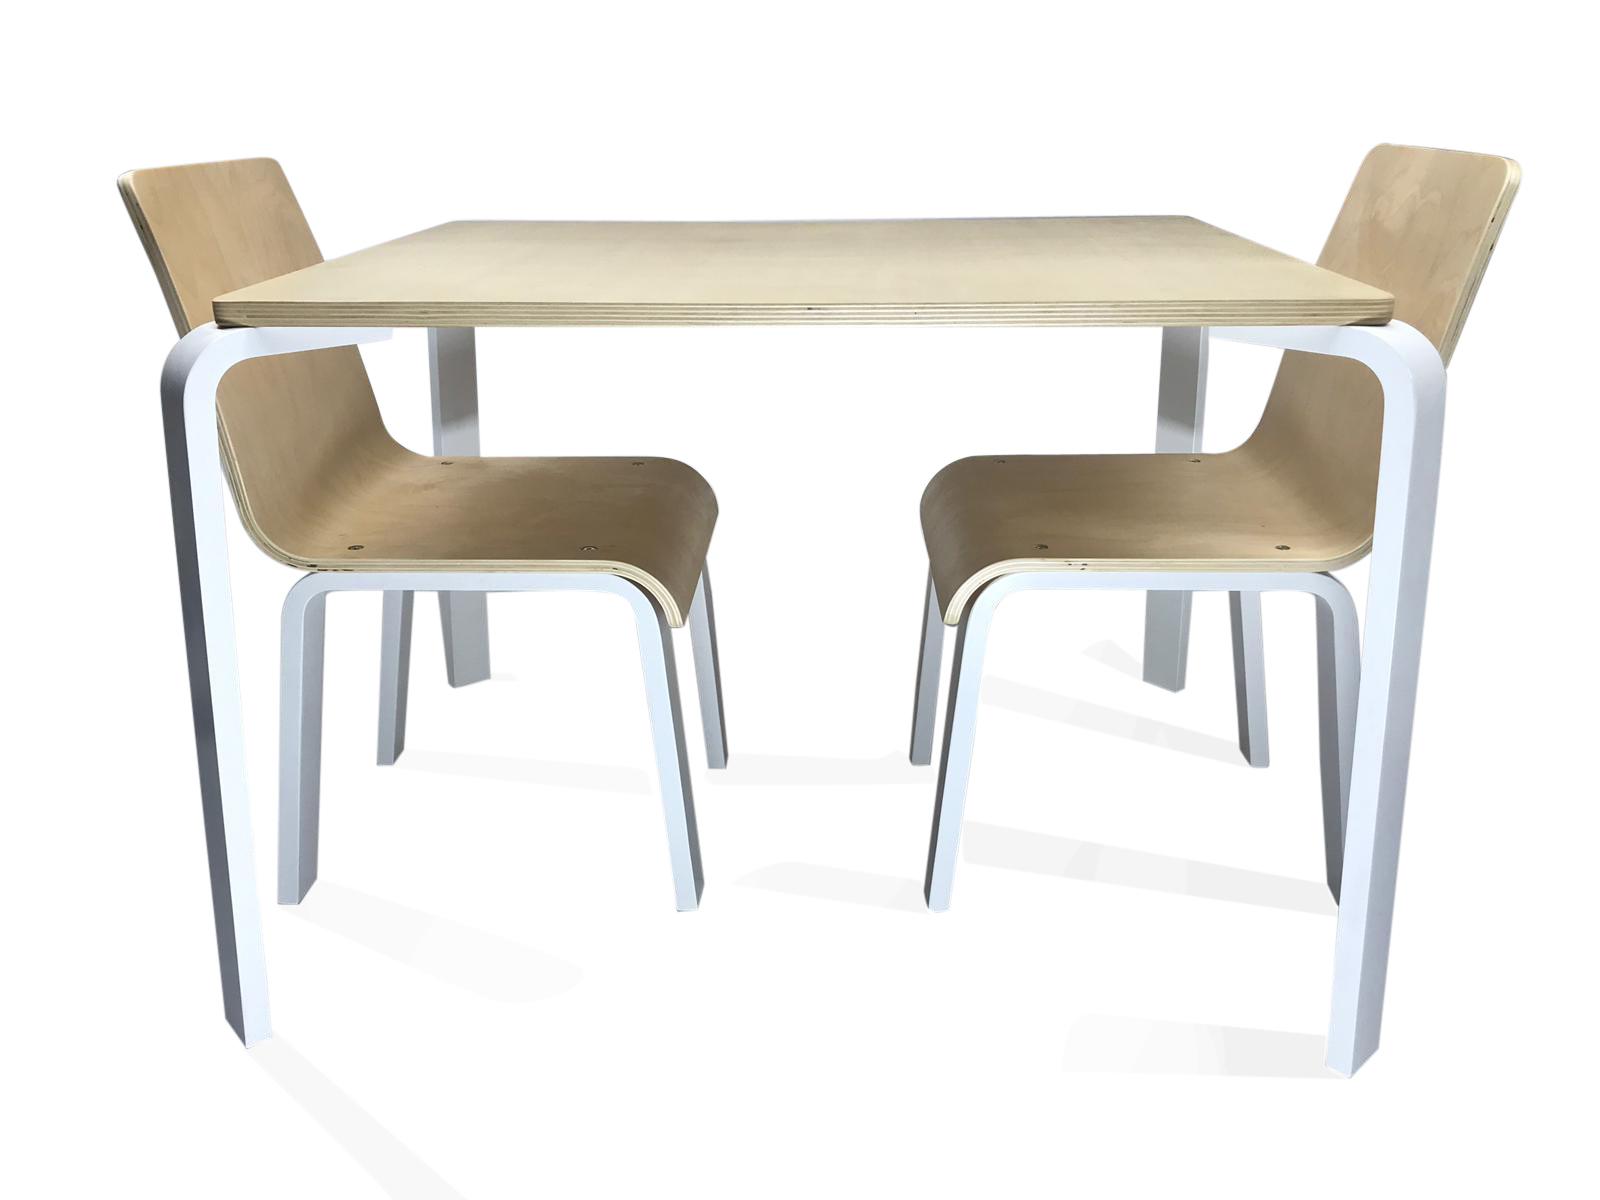 Kindertafel Met Twee Stoeltjes.Diaz Hoge Kindertafel Met Twee Stoeltjes